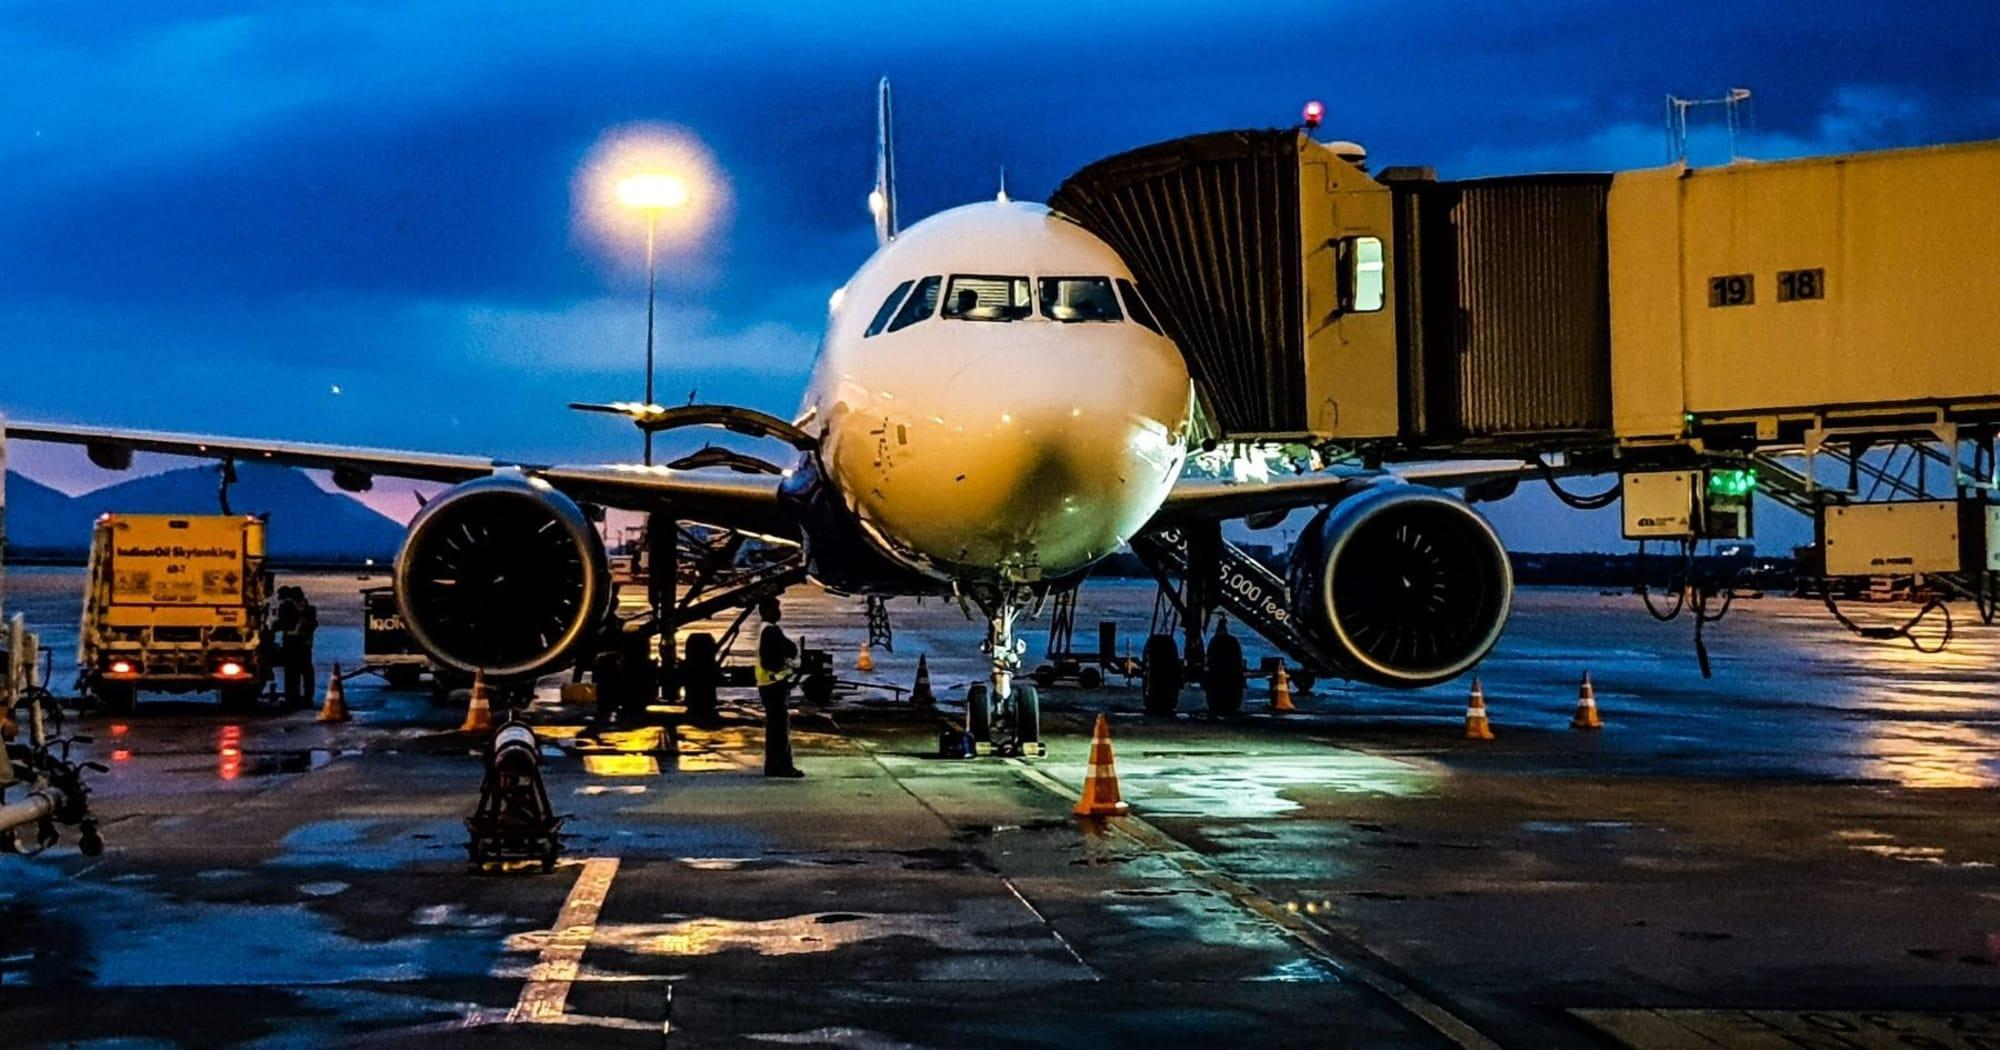 PAL to cancel more international flights